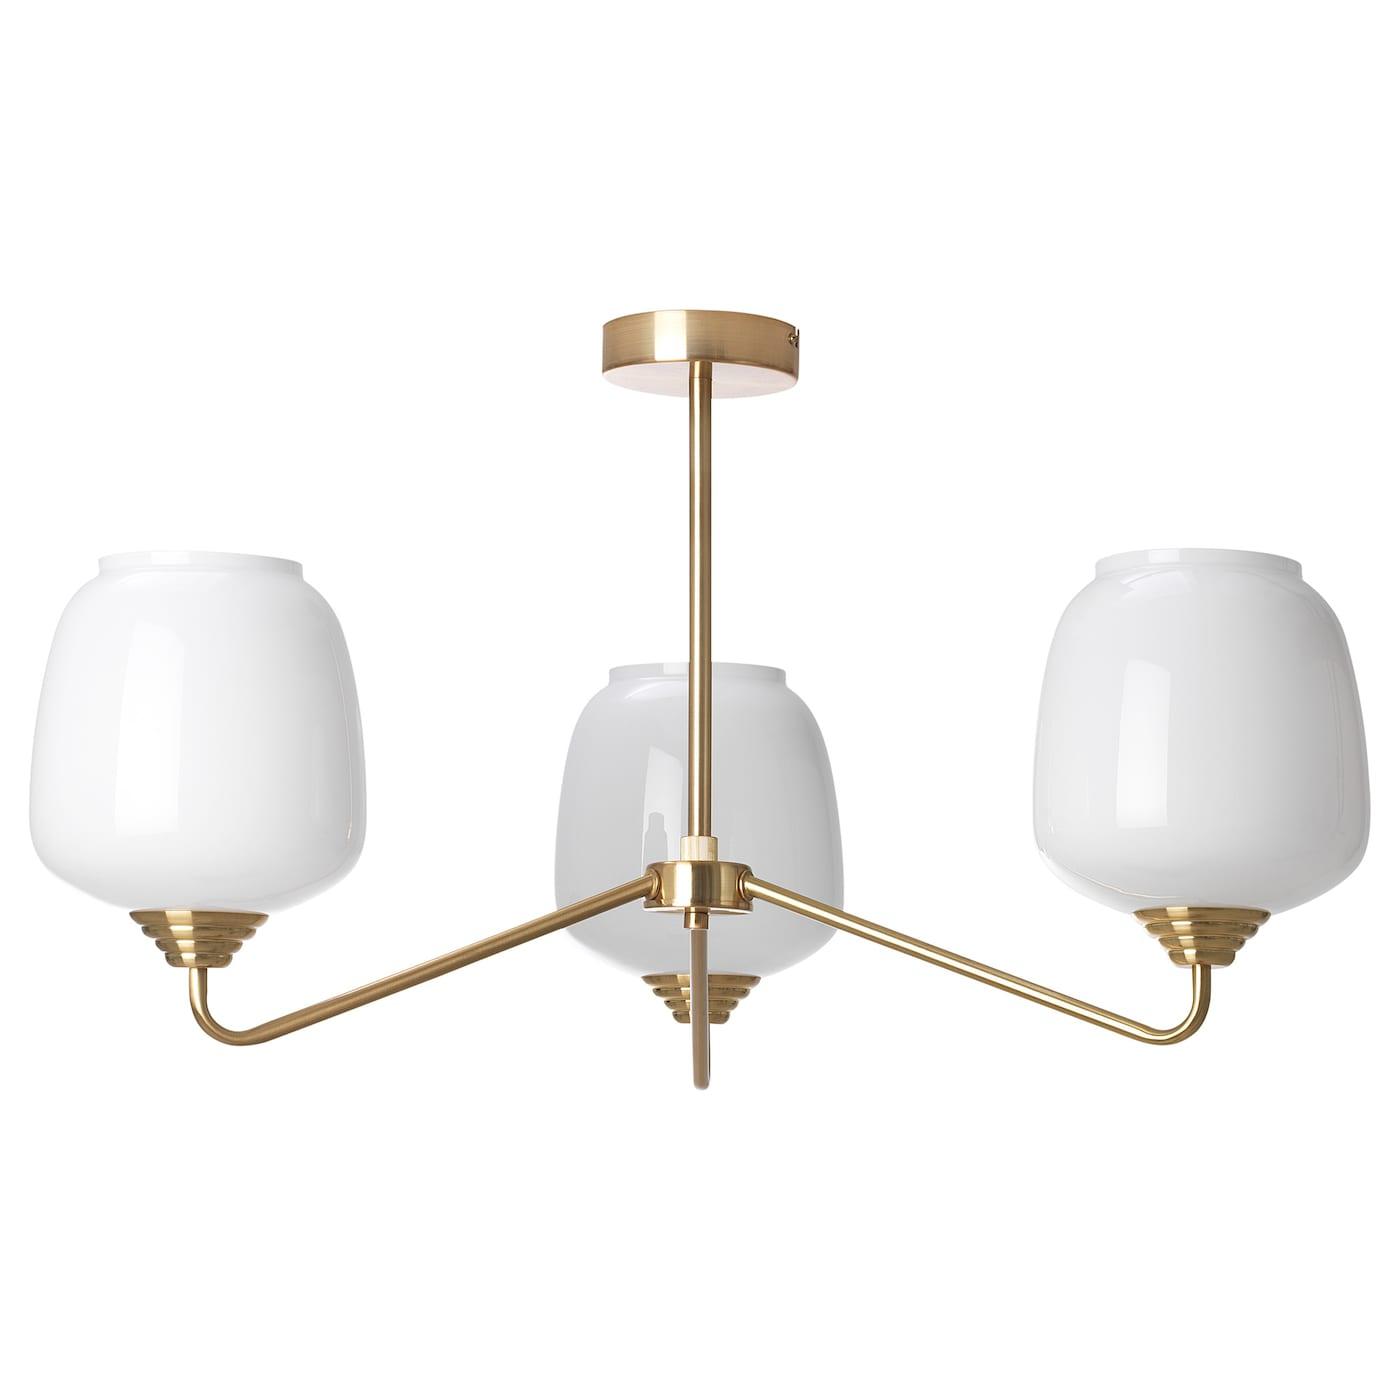 ÅTERSKEN Ceiling lamp with 10 lights - opal glass